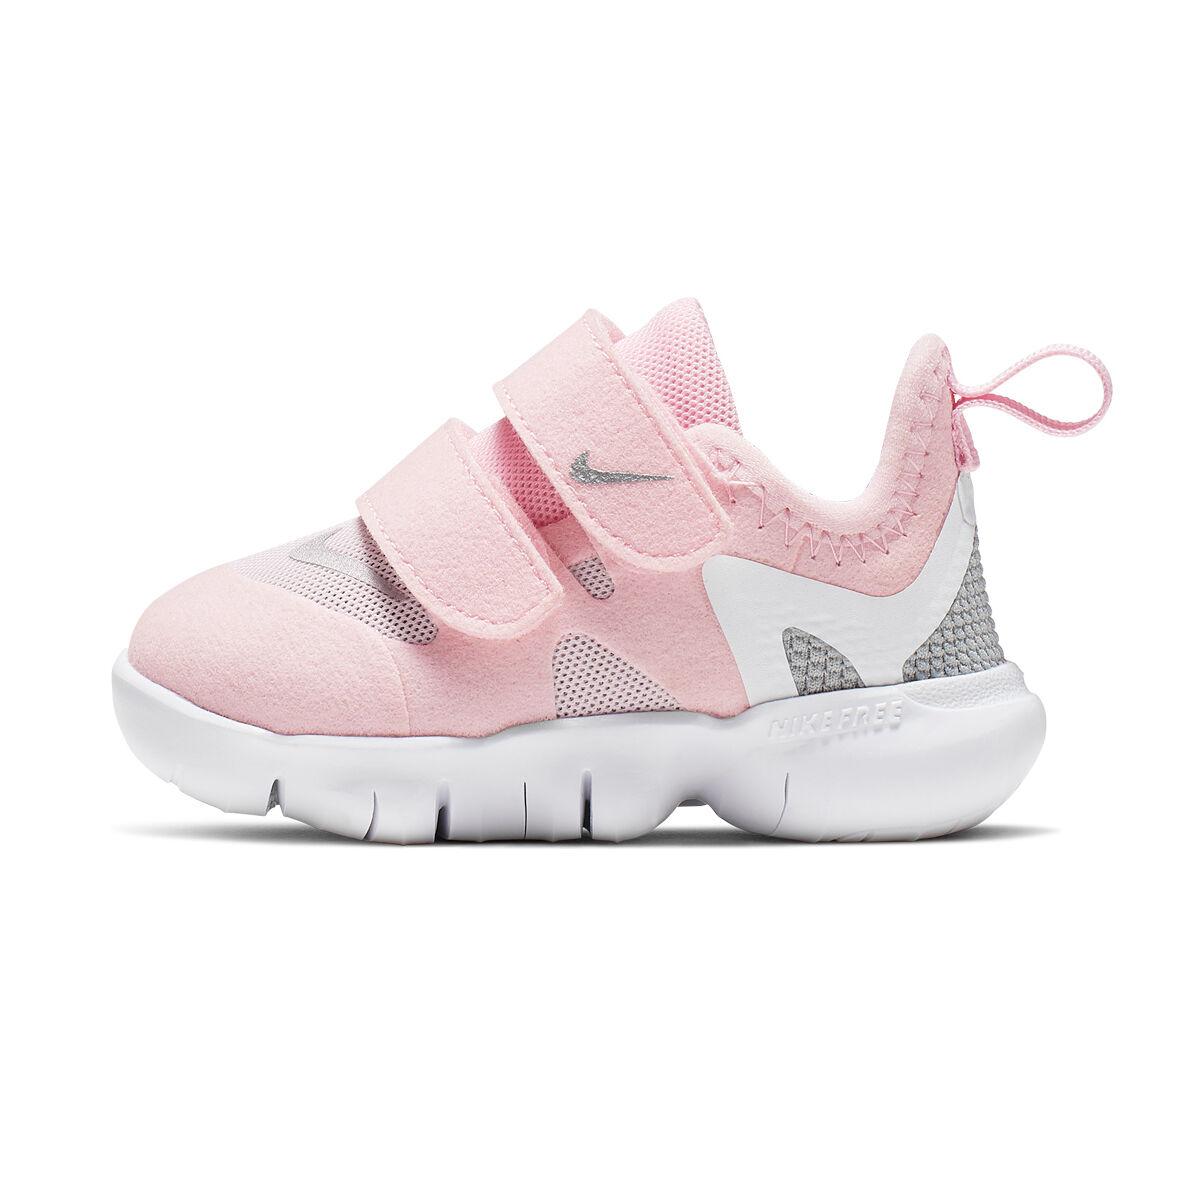 Nike Free RN 5.0 Tolders Running Shoes